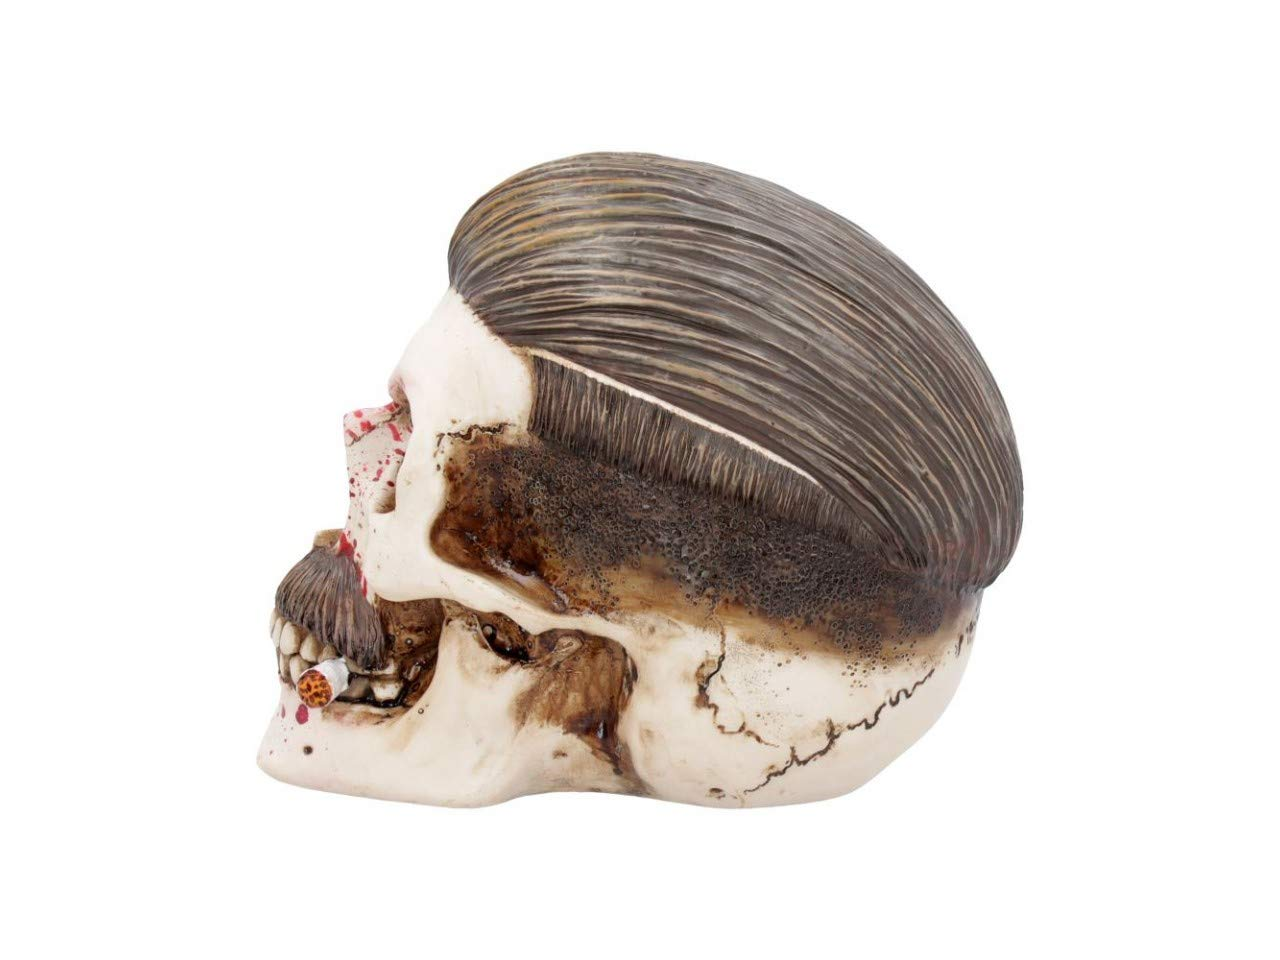 Nemesis Now Cráneo Decorativo Birmingham Henchman - 18.5cm: Amazon.es: Hogar